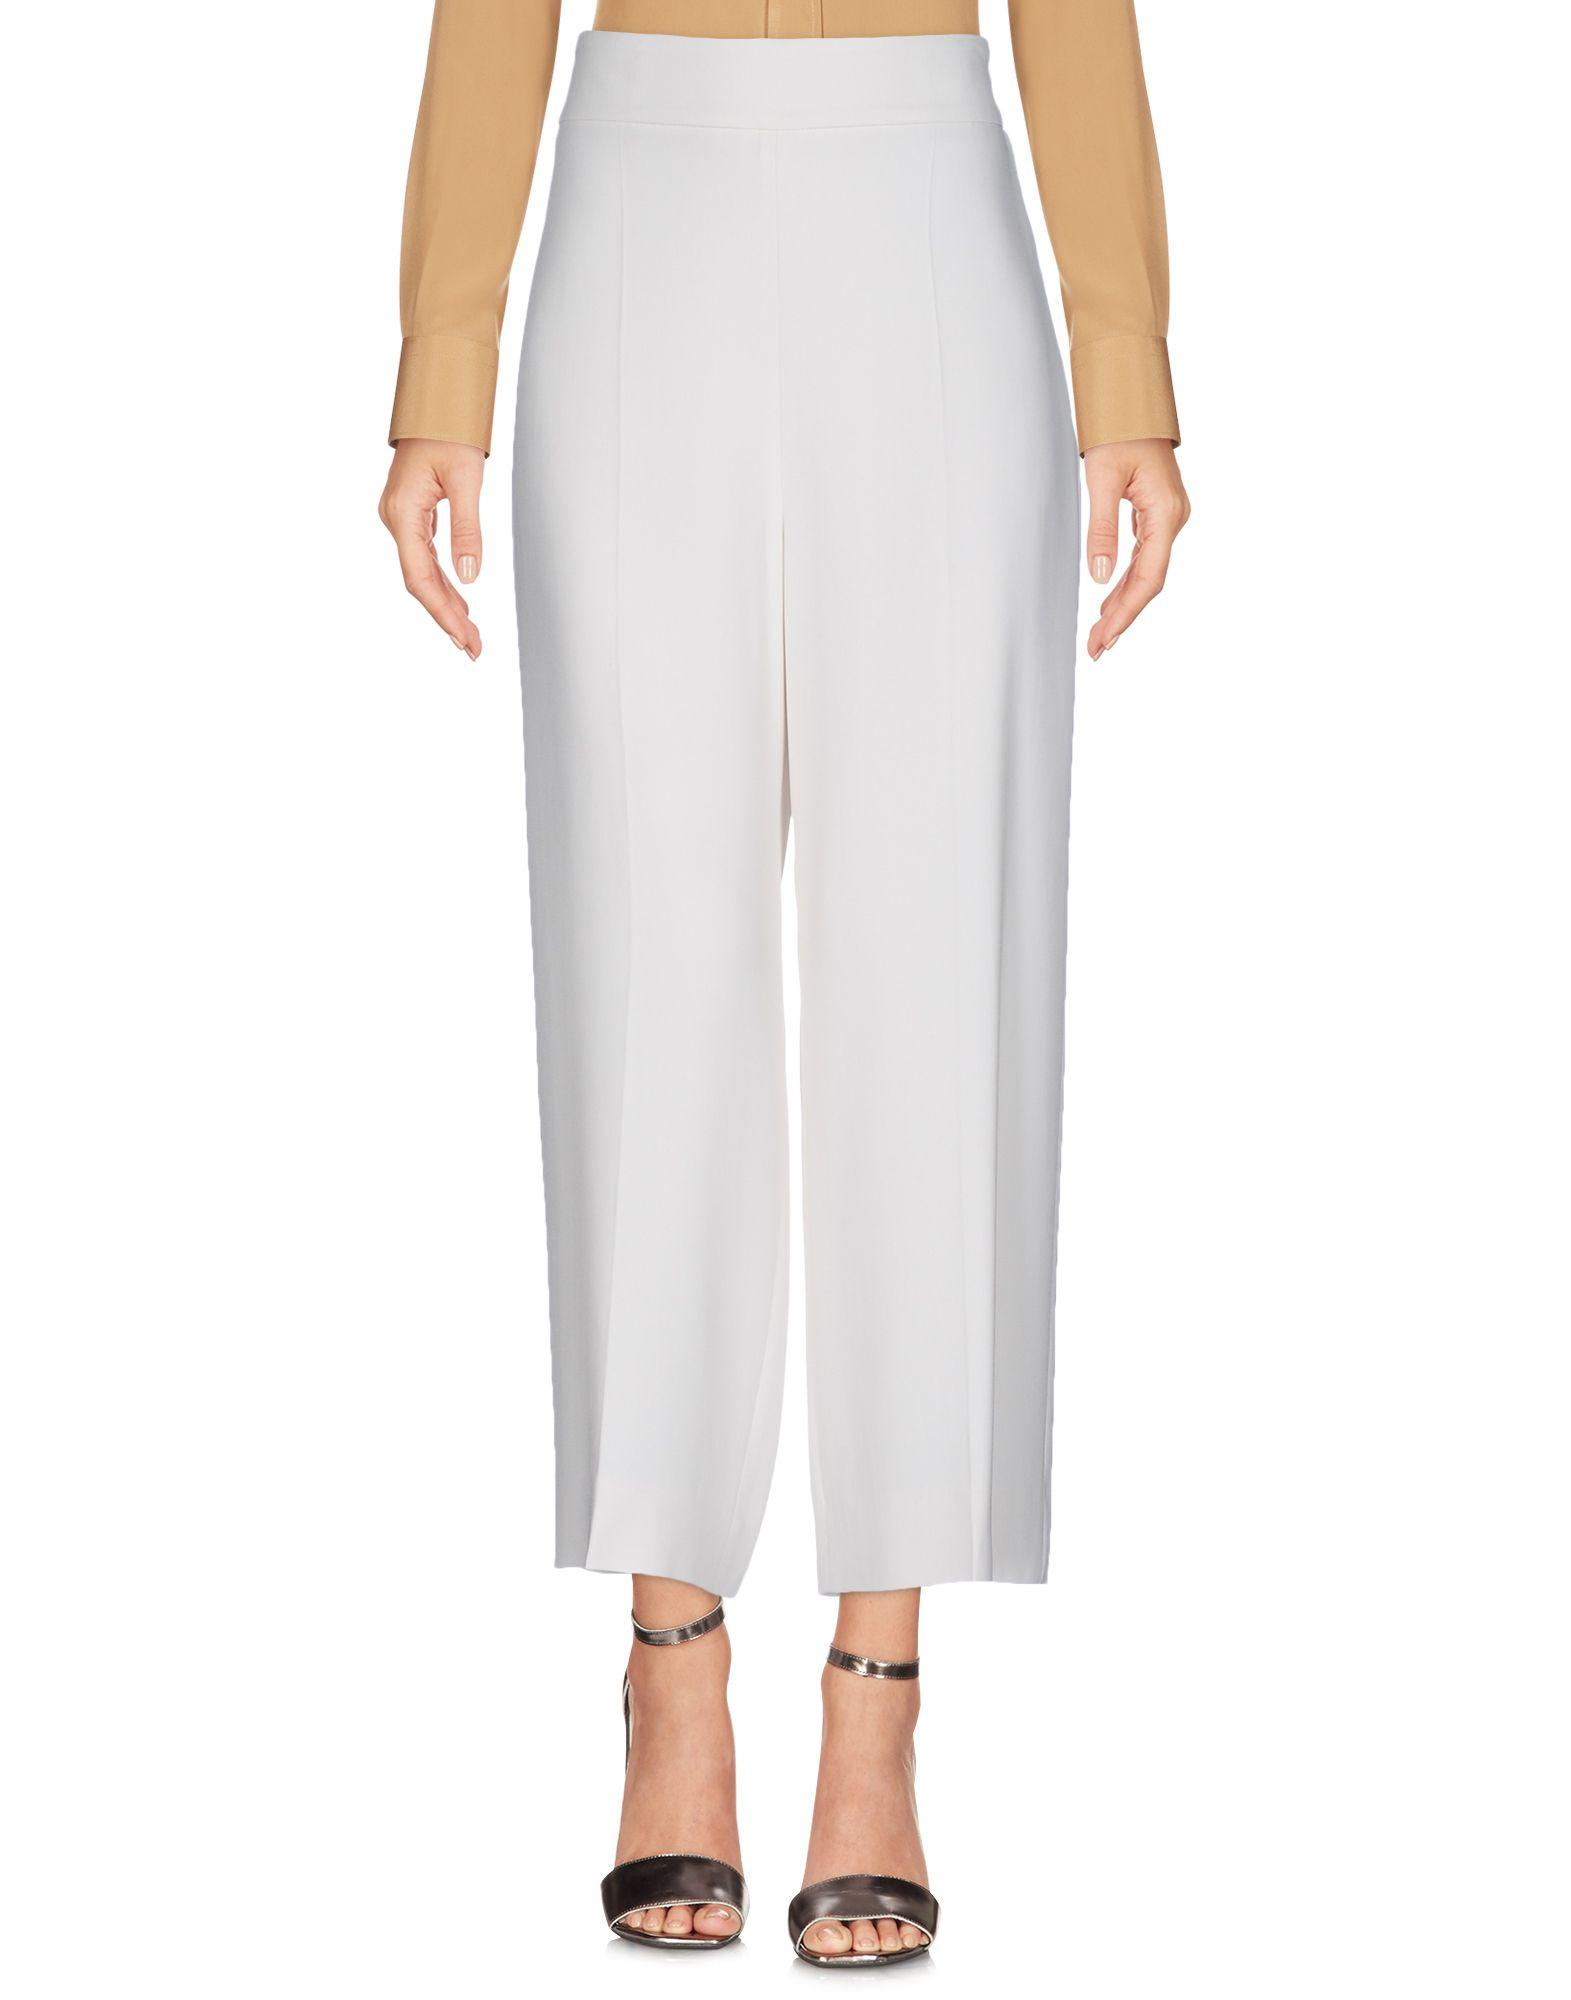 Pantalone 'S Max Mara Donna - Acquista online su CJPUTn